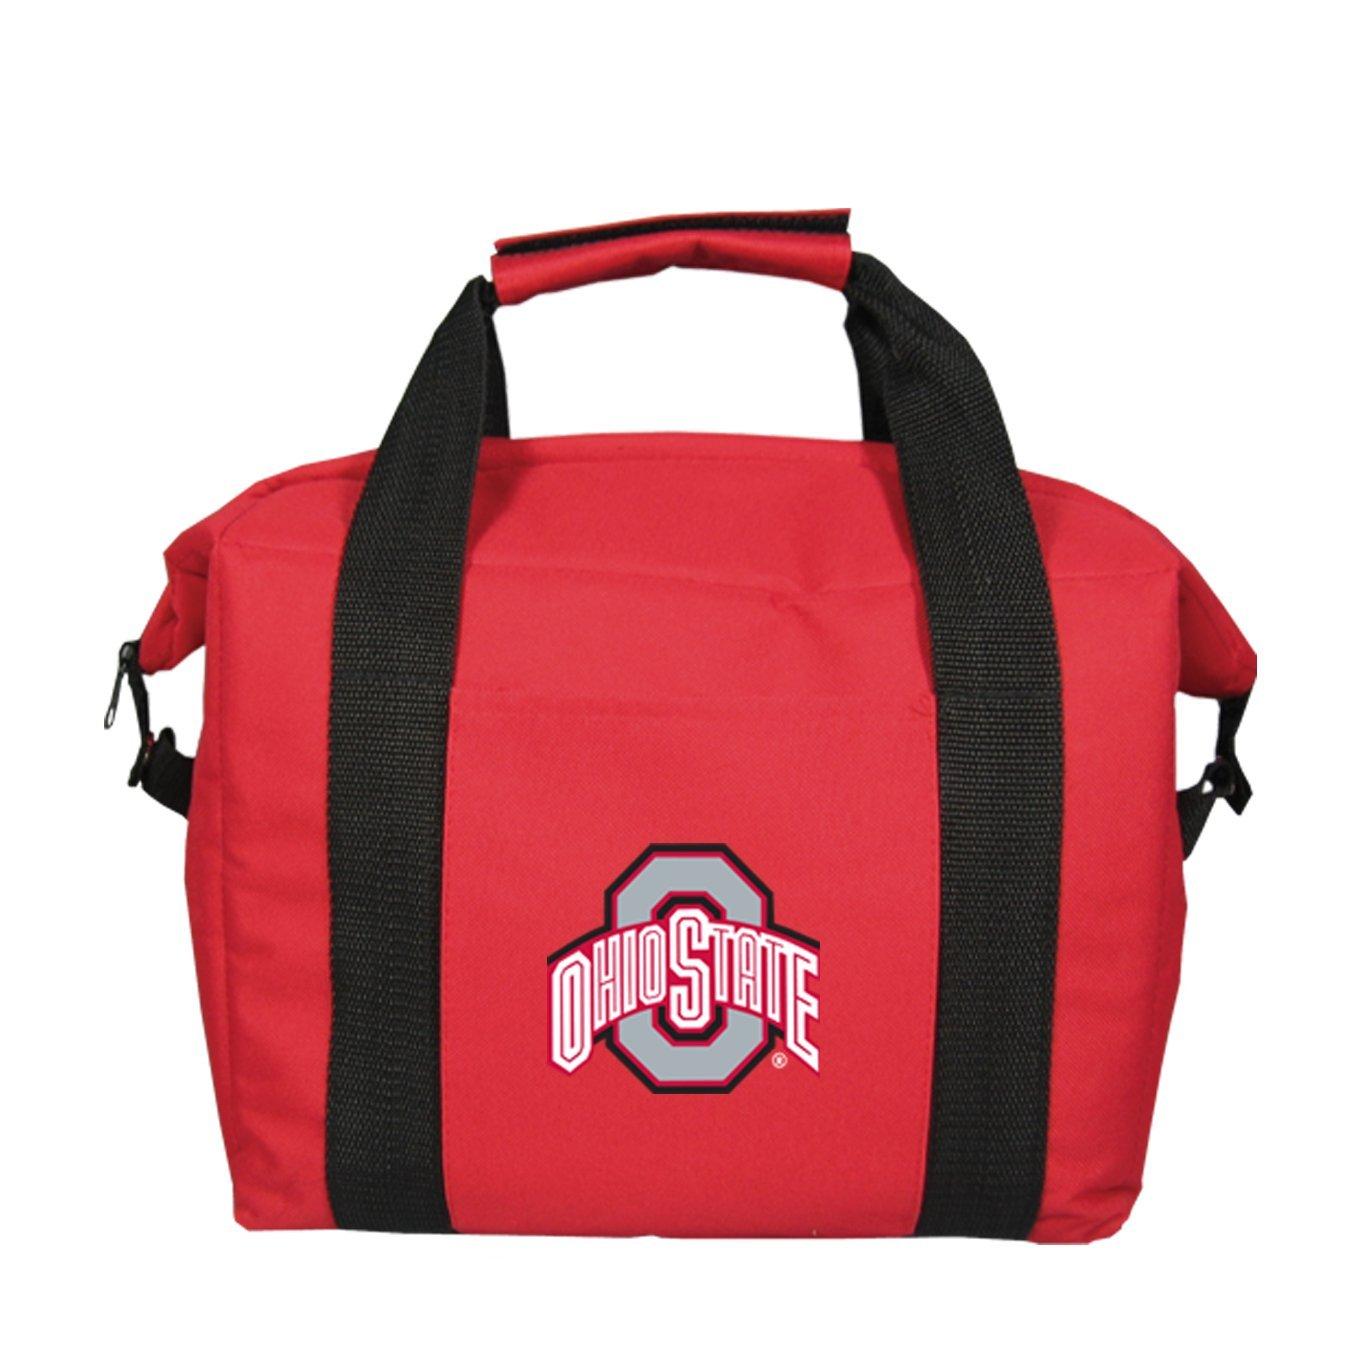 NCAA Ohio State Buckeyes 12 Can Cooler Bag